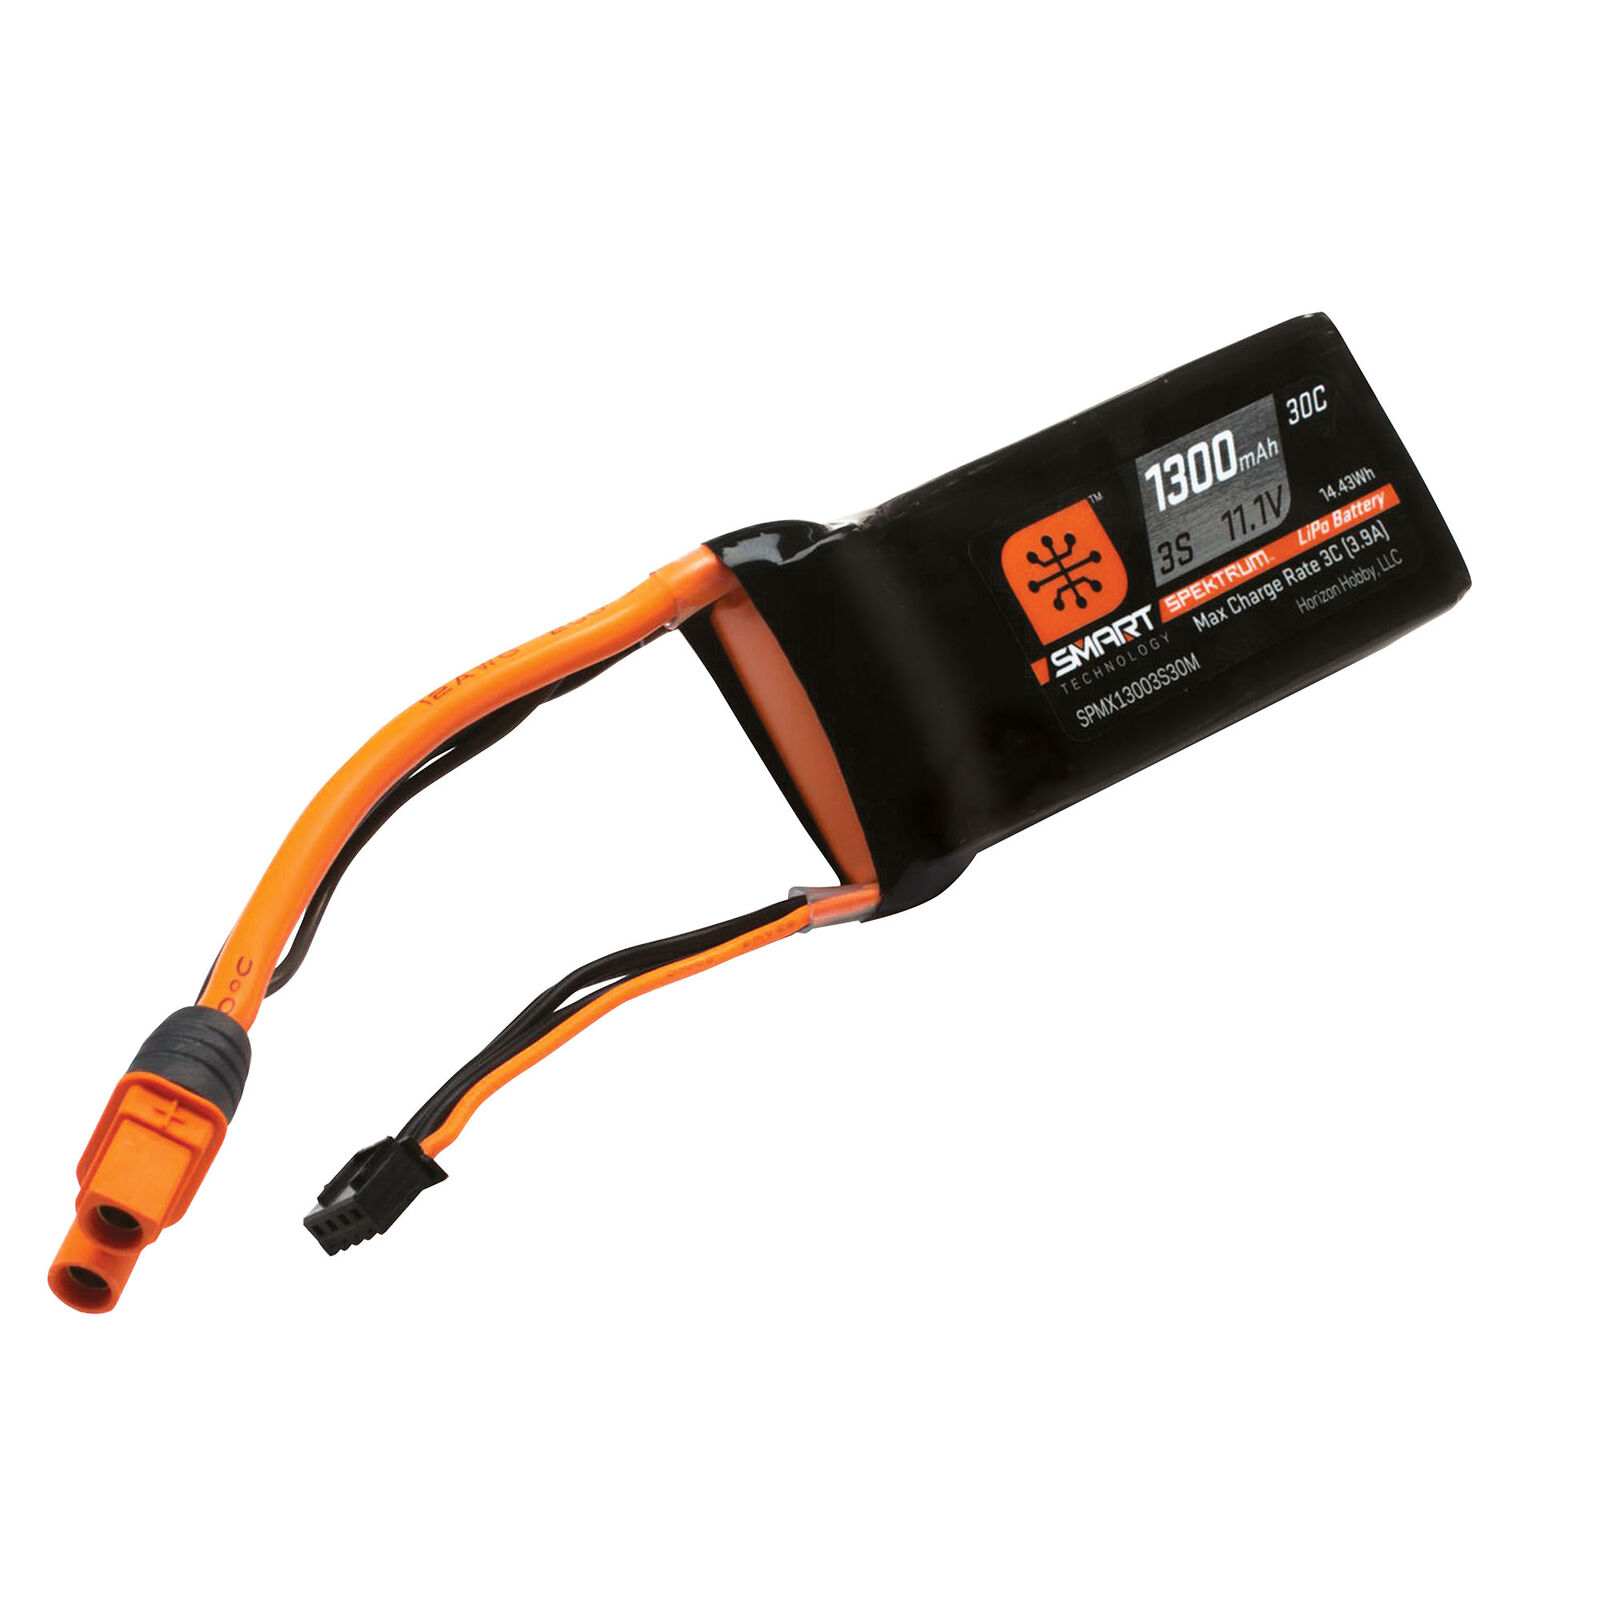 11.1V 1300mAh 3S 30C Smart LiPo Battery: IC3